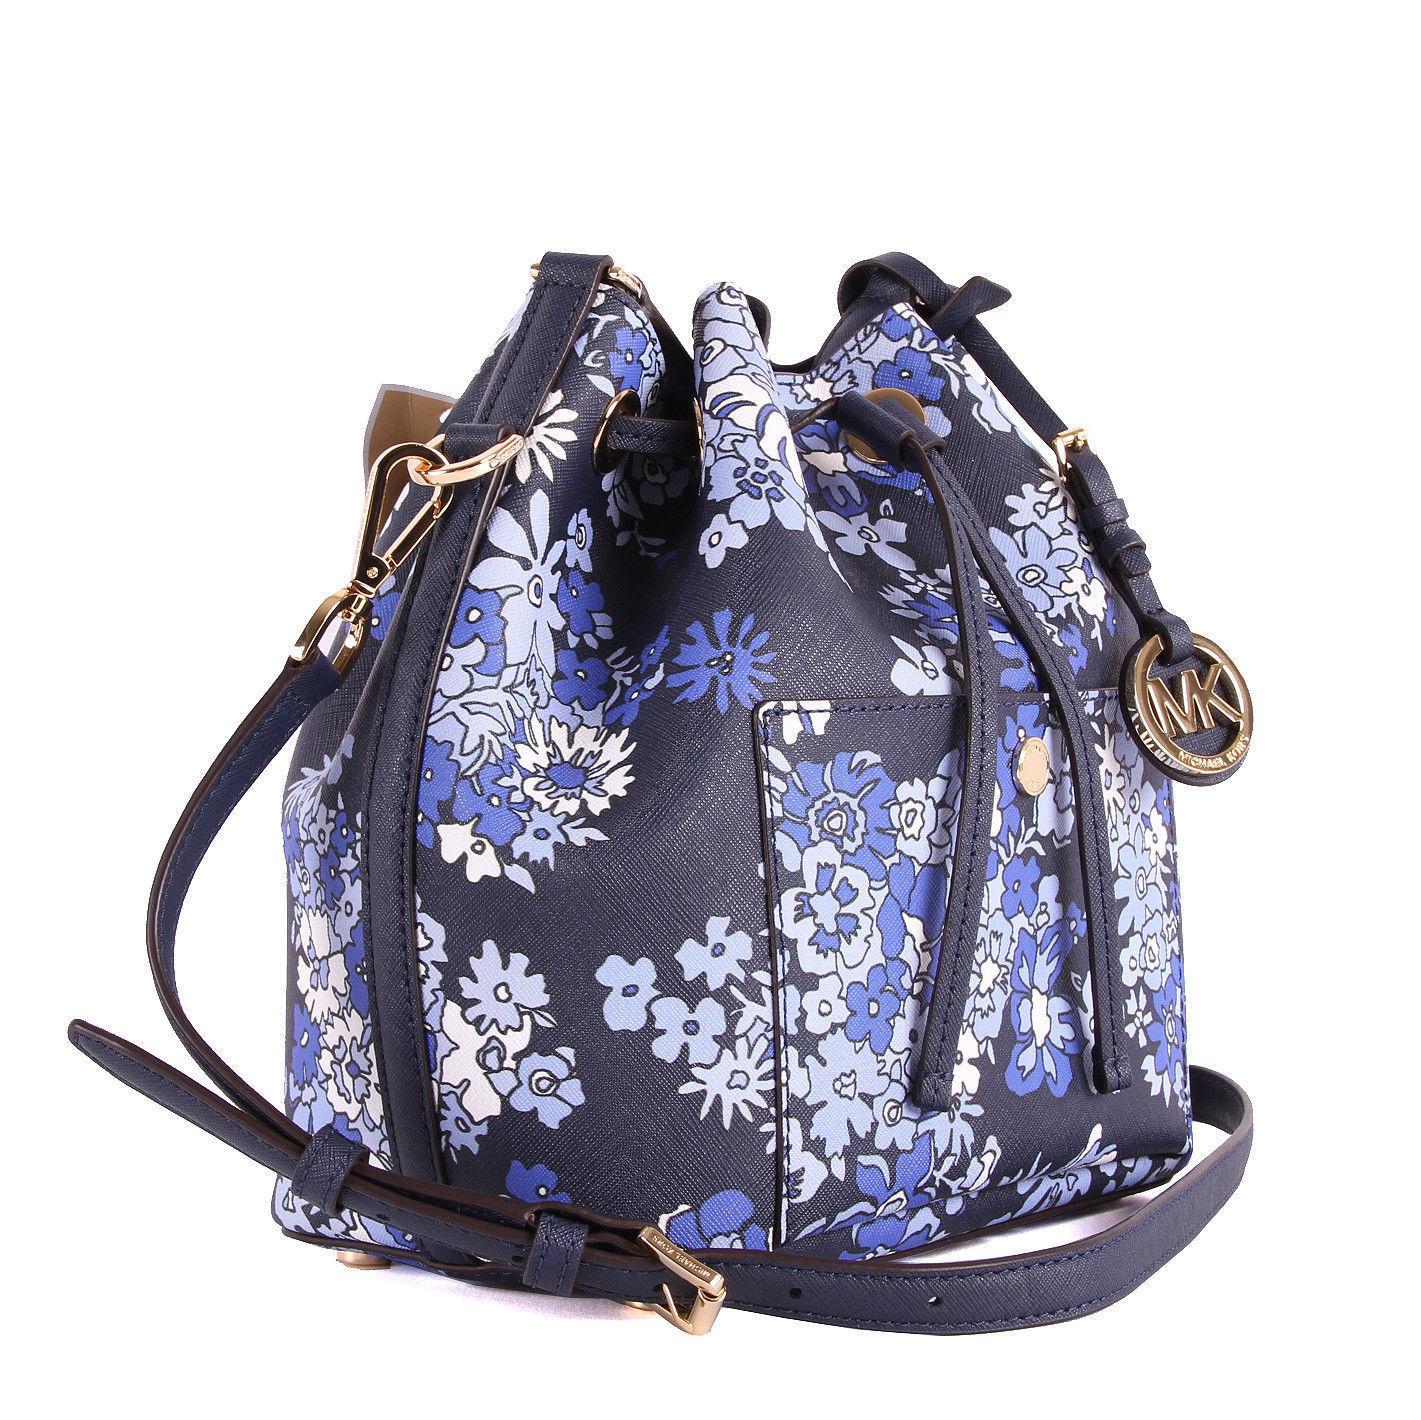 8aca27f4b329 Michael Kors Greenwich Medium Bucket Bag and 50 similar items